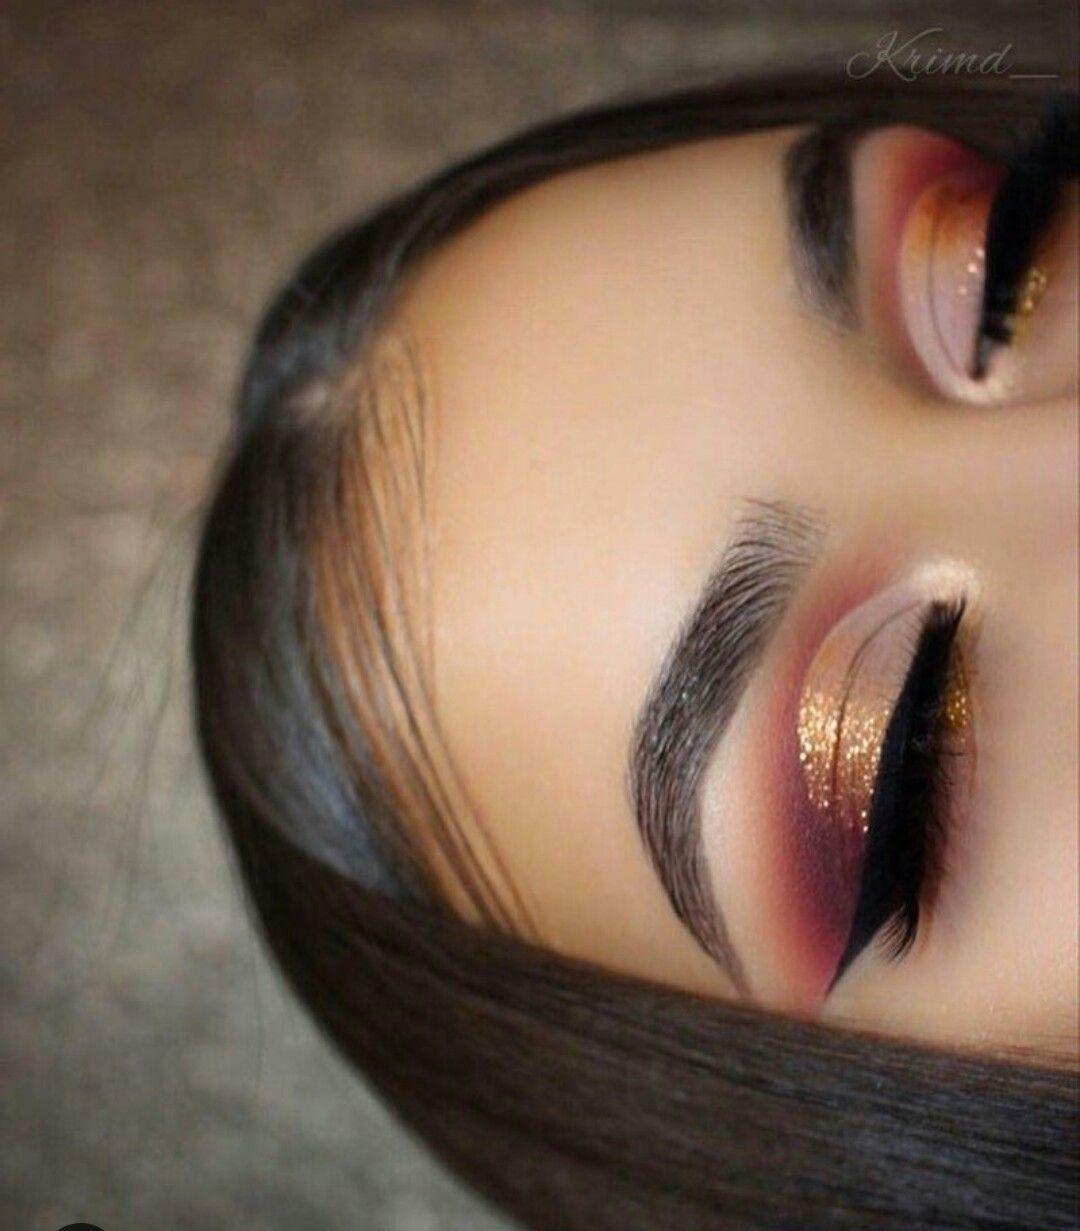 Violet voss m a k e u p pinterest violet voss violets and makeup